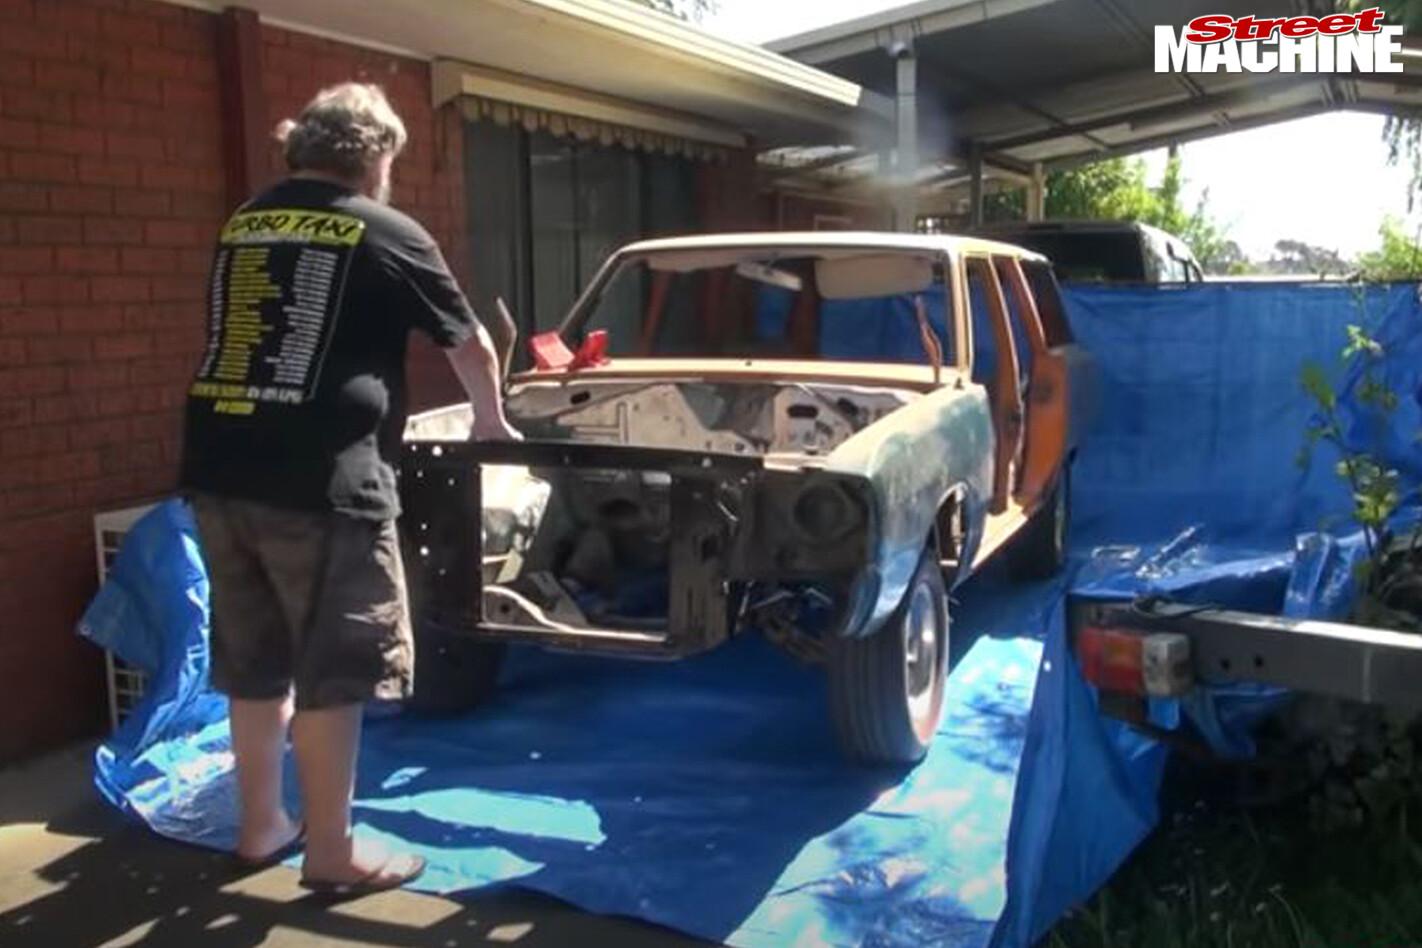 Street Machine TV Sandblasting Ve Valiant Wagon 3